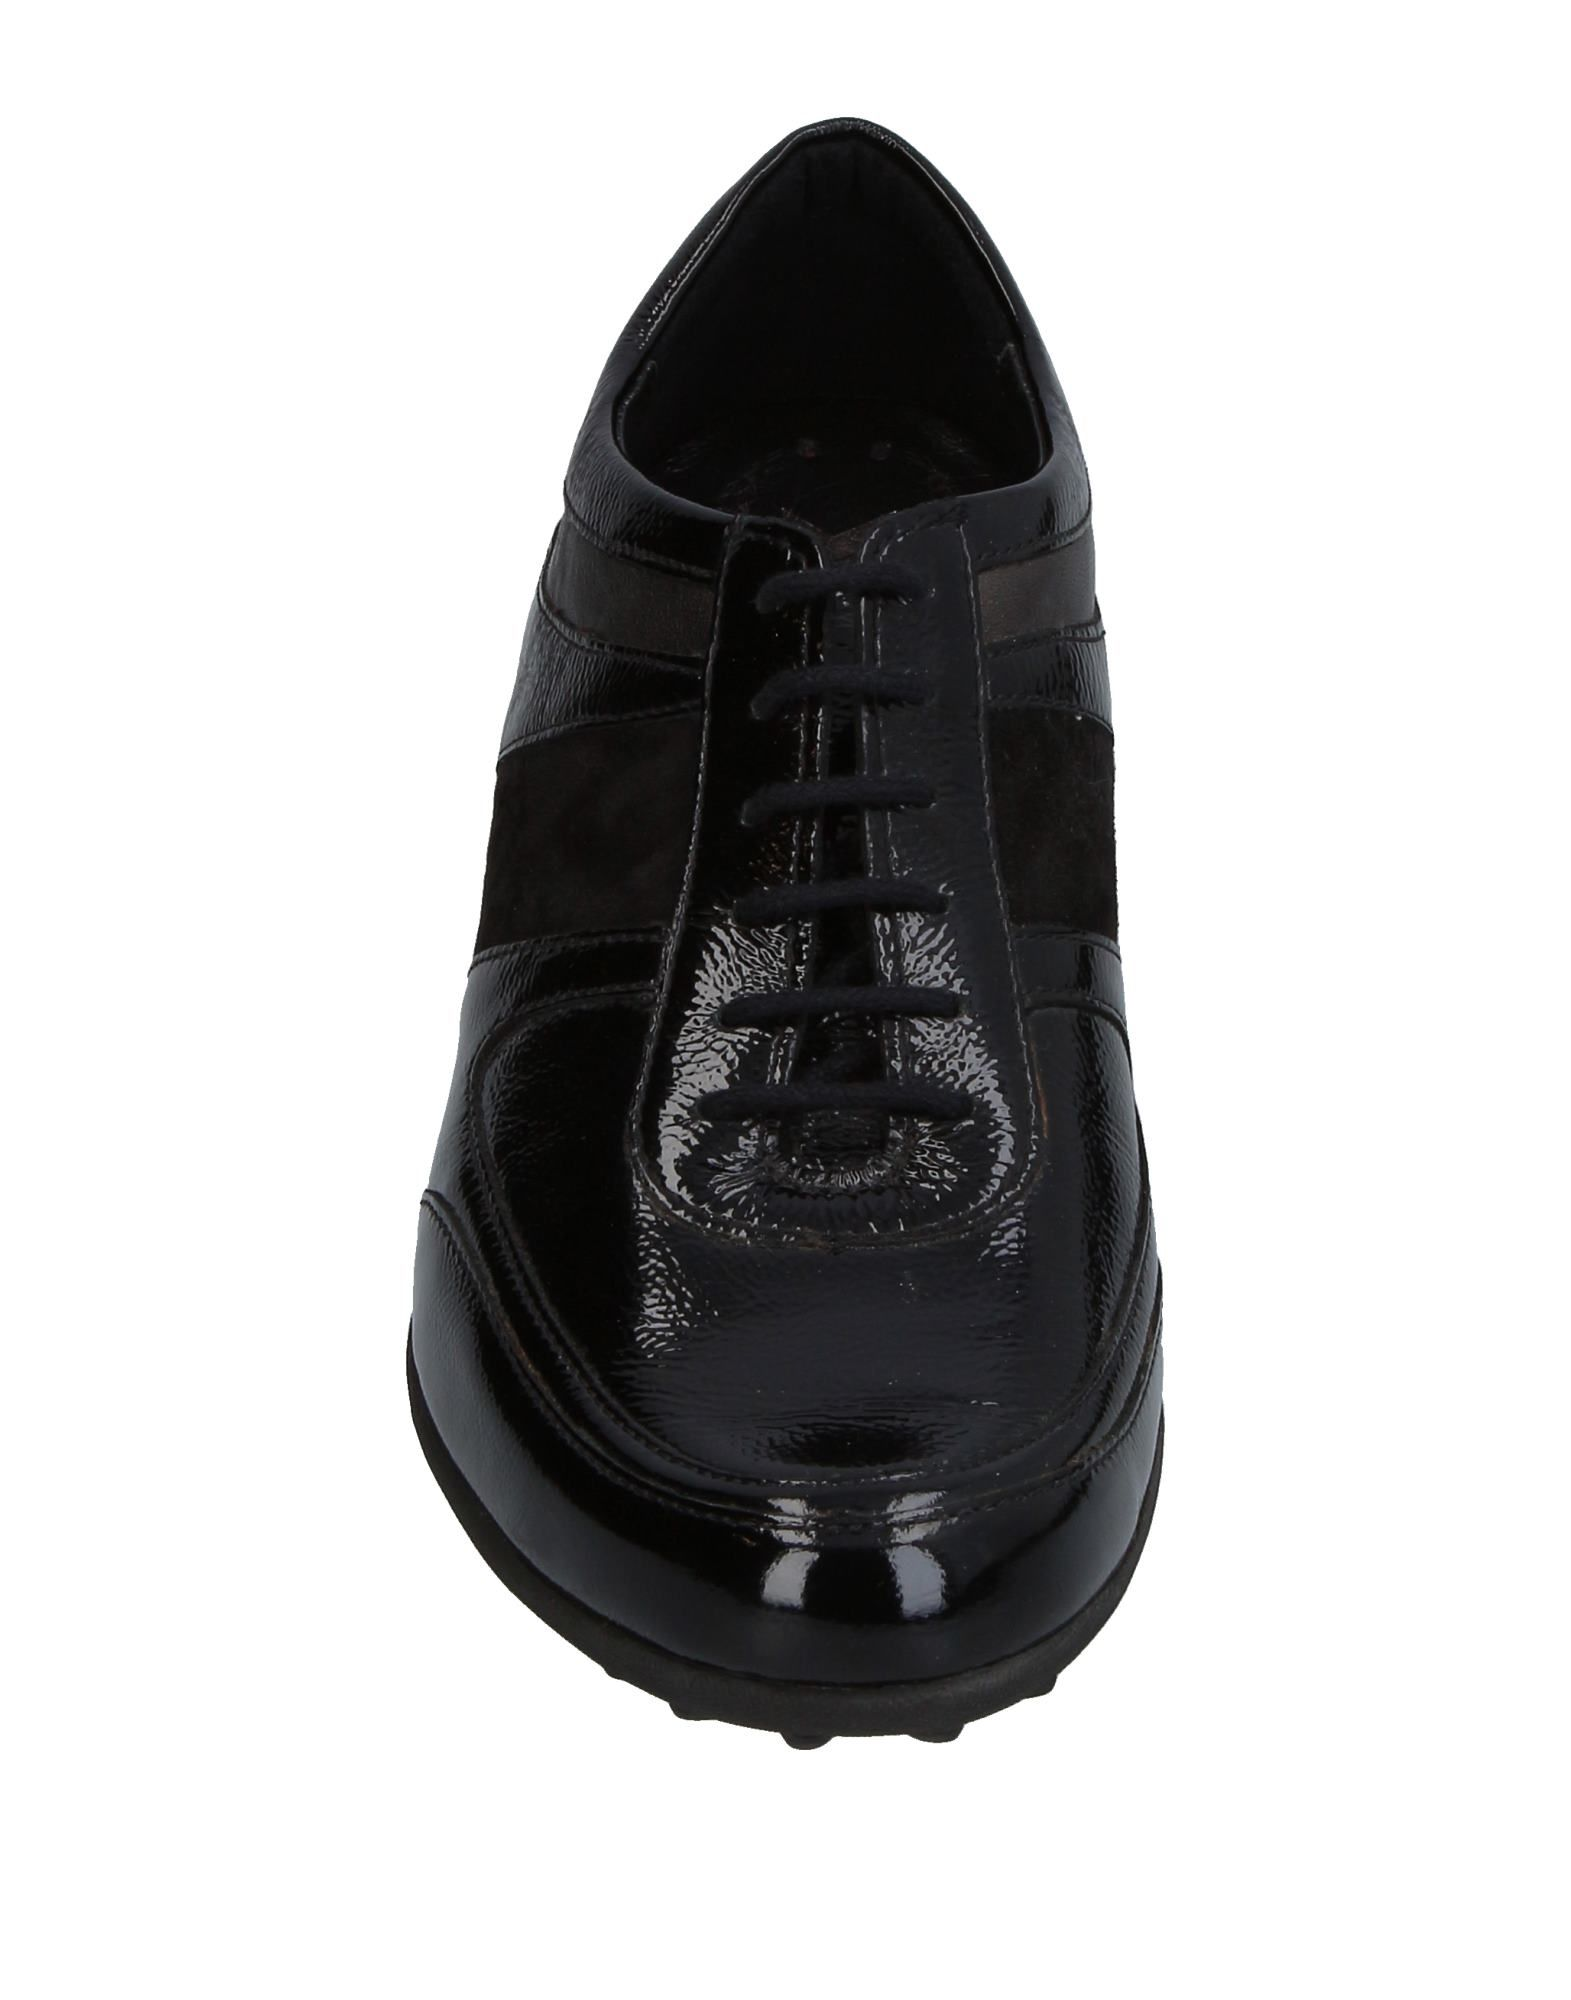 Sneakers Mephisto Femme - Sneakers Mephisto sur